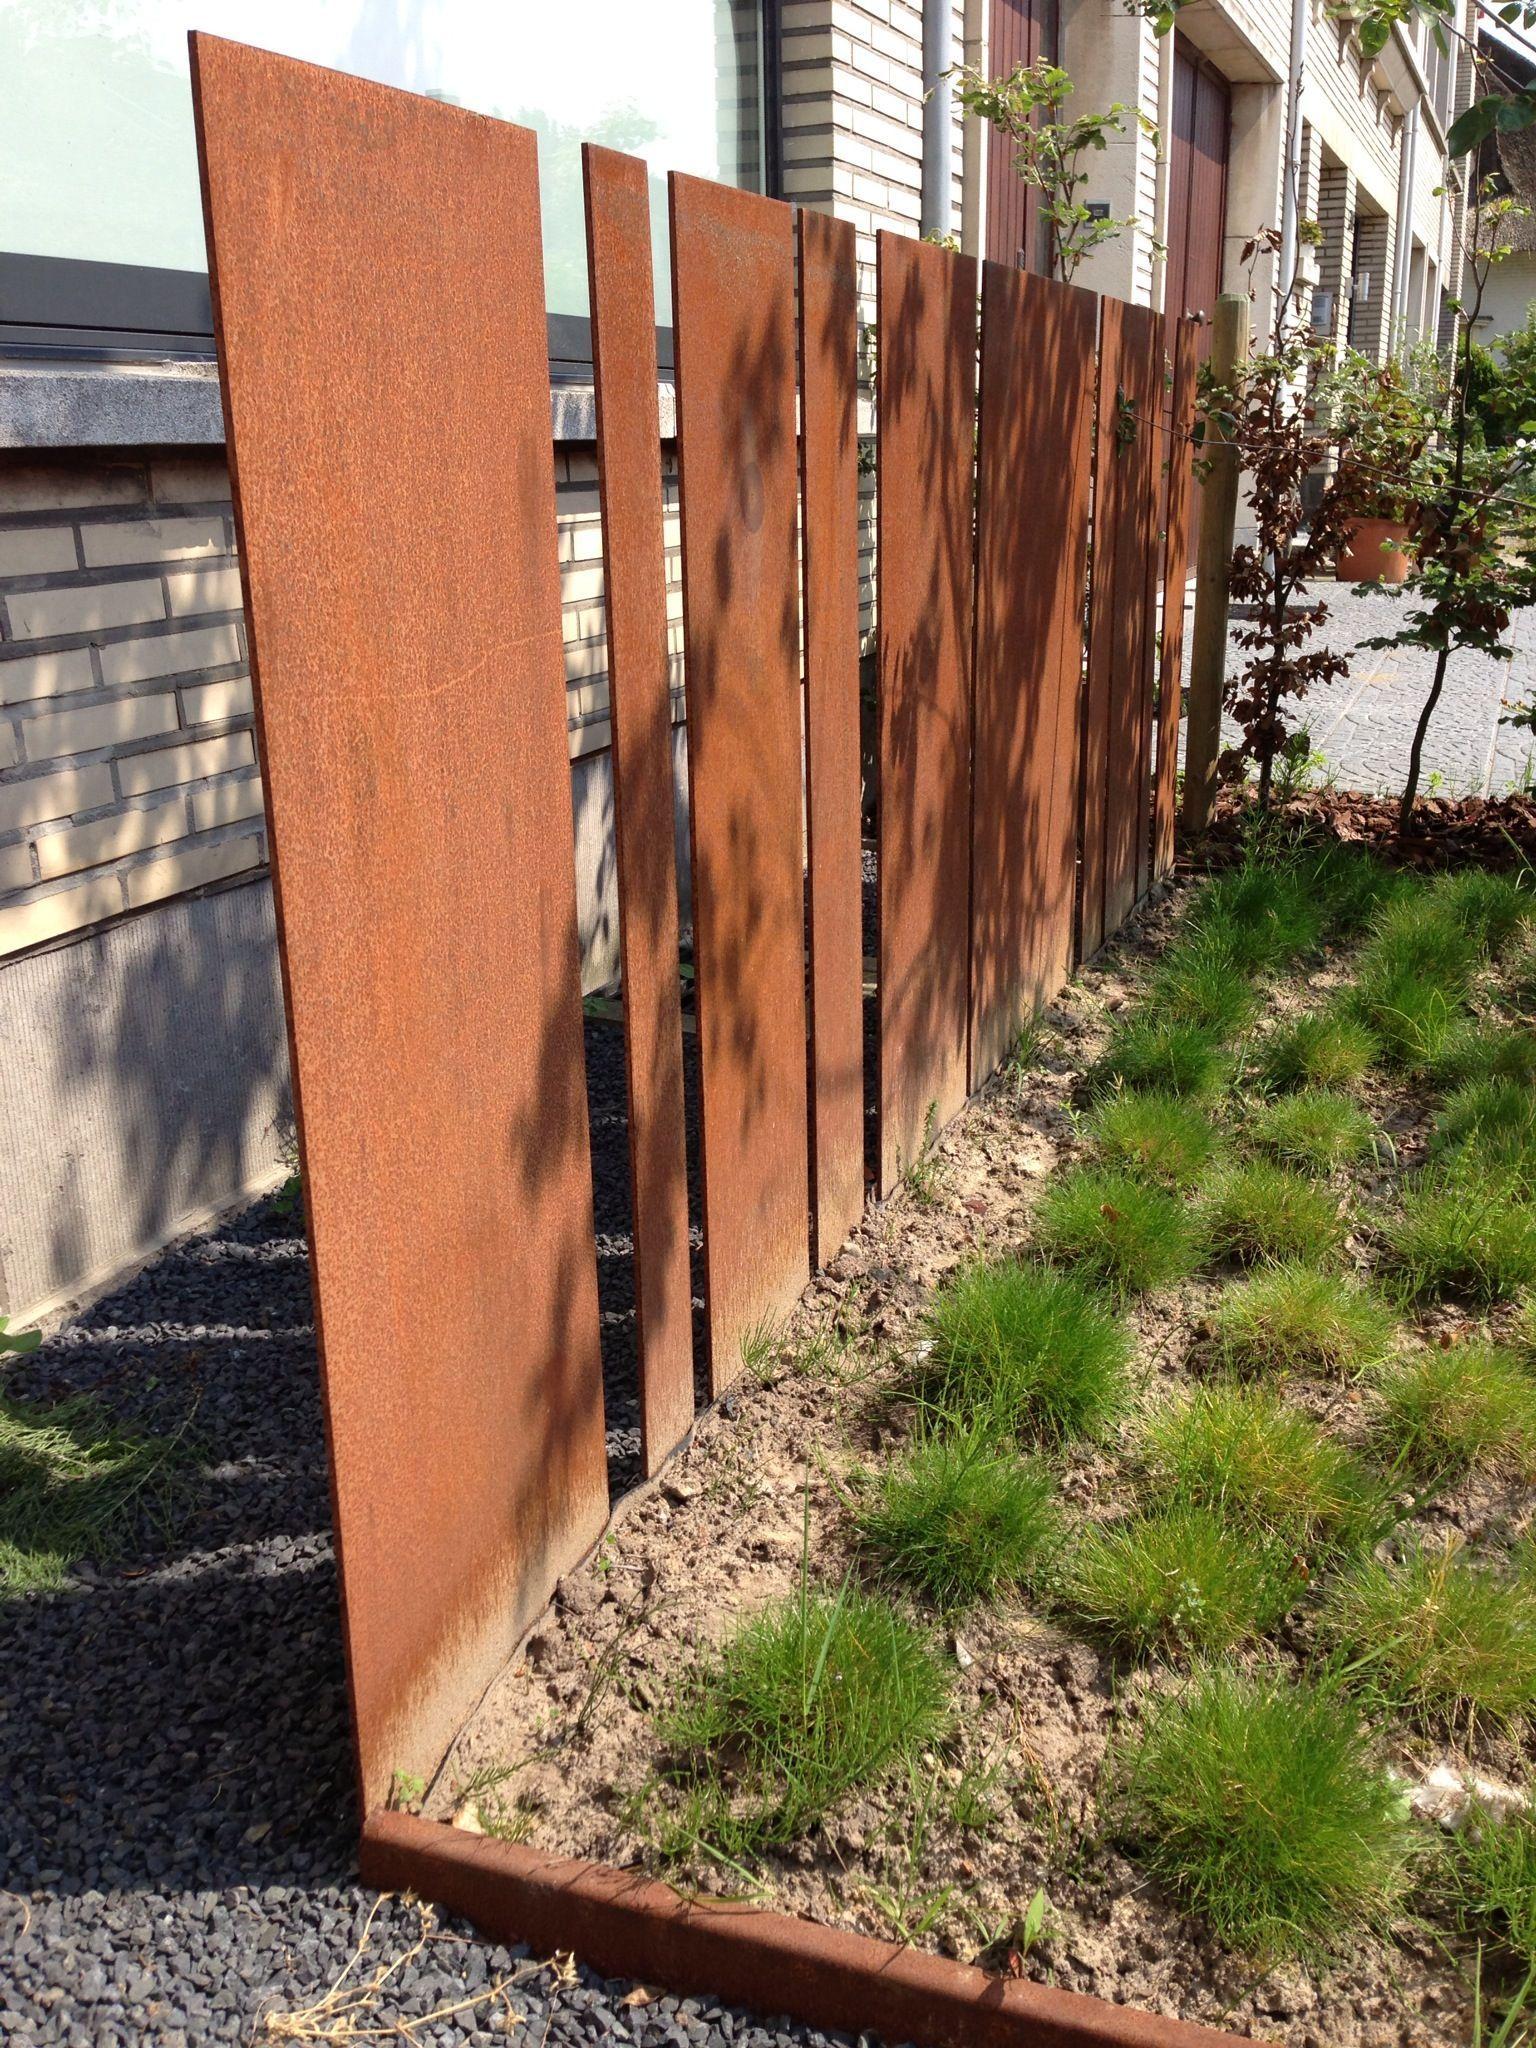 Pin By Haoyang Li On Donor Recognition Garden Fencing Gartengestaltung Gartenzaun Ideen Sichtschutz Garten